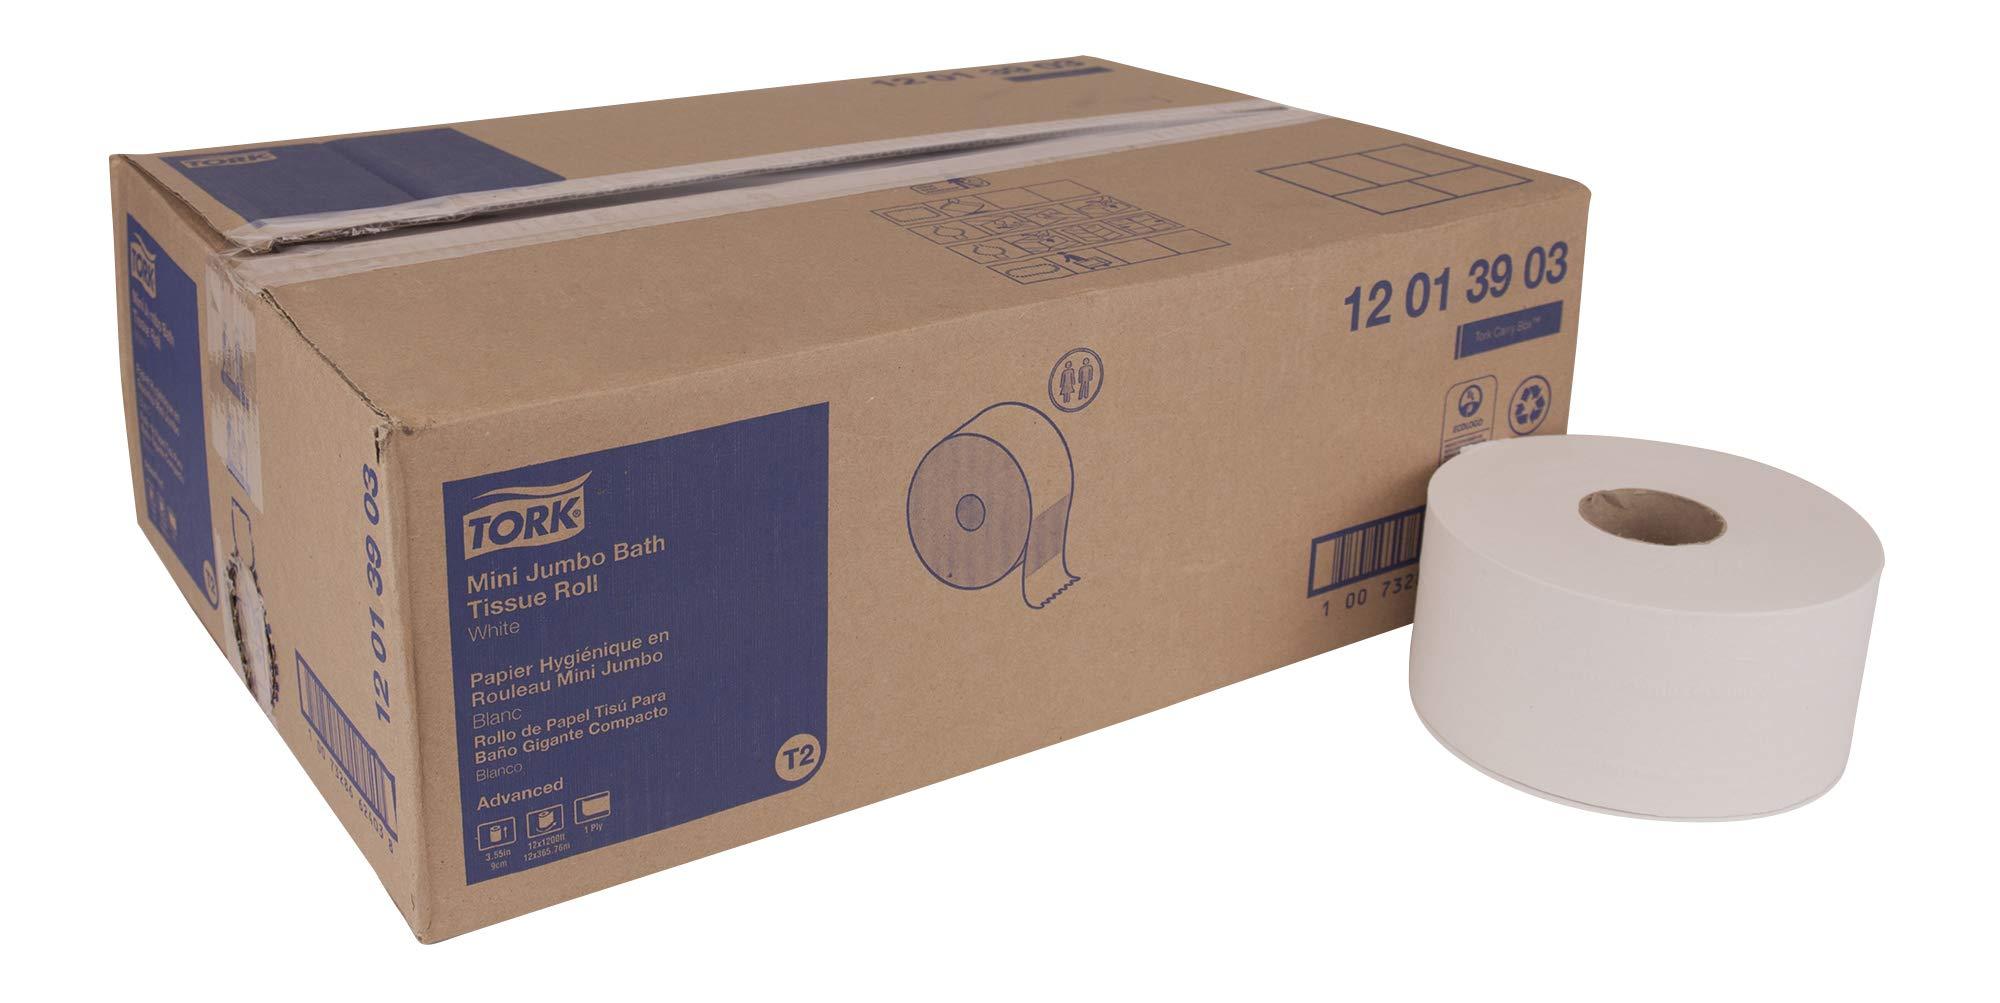 Tork Advanced 12013903 Mini Jumbo Bath Tissue Roll, 1-Ply, 7.36'' Diameter, 3.55'' Width x 1,200' Length, White (Case of 12 Rolls, 1,200' per Roll, 14,400 Feet)